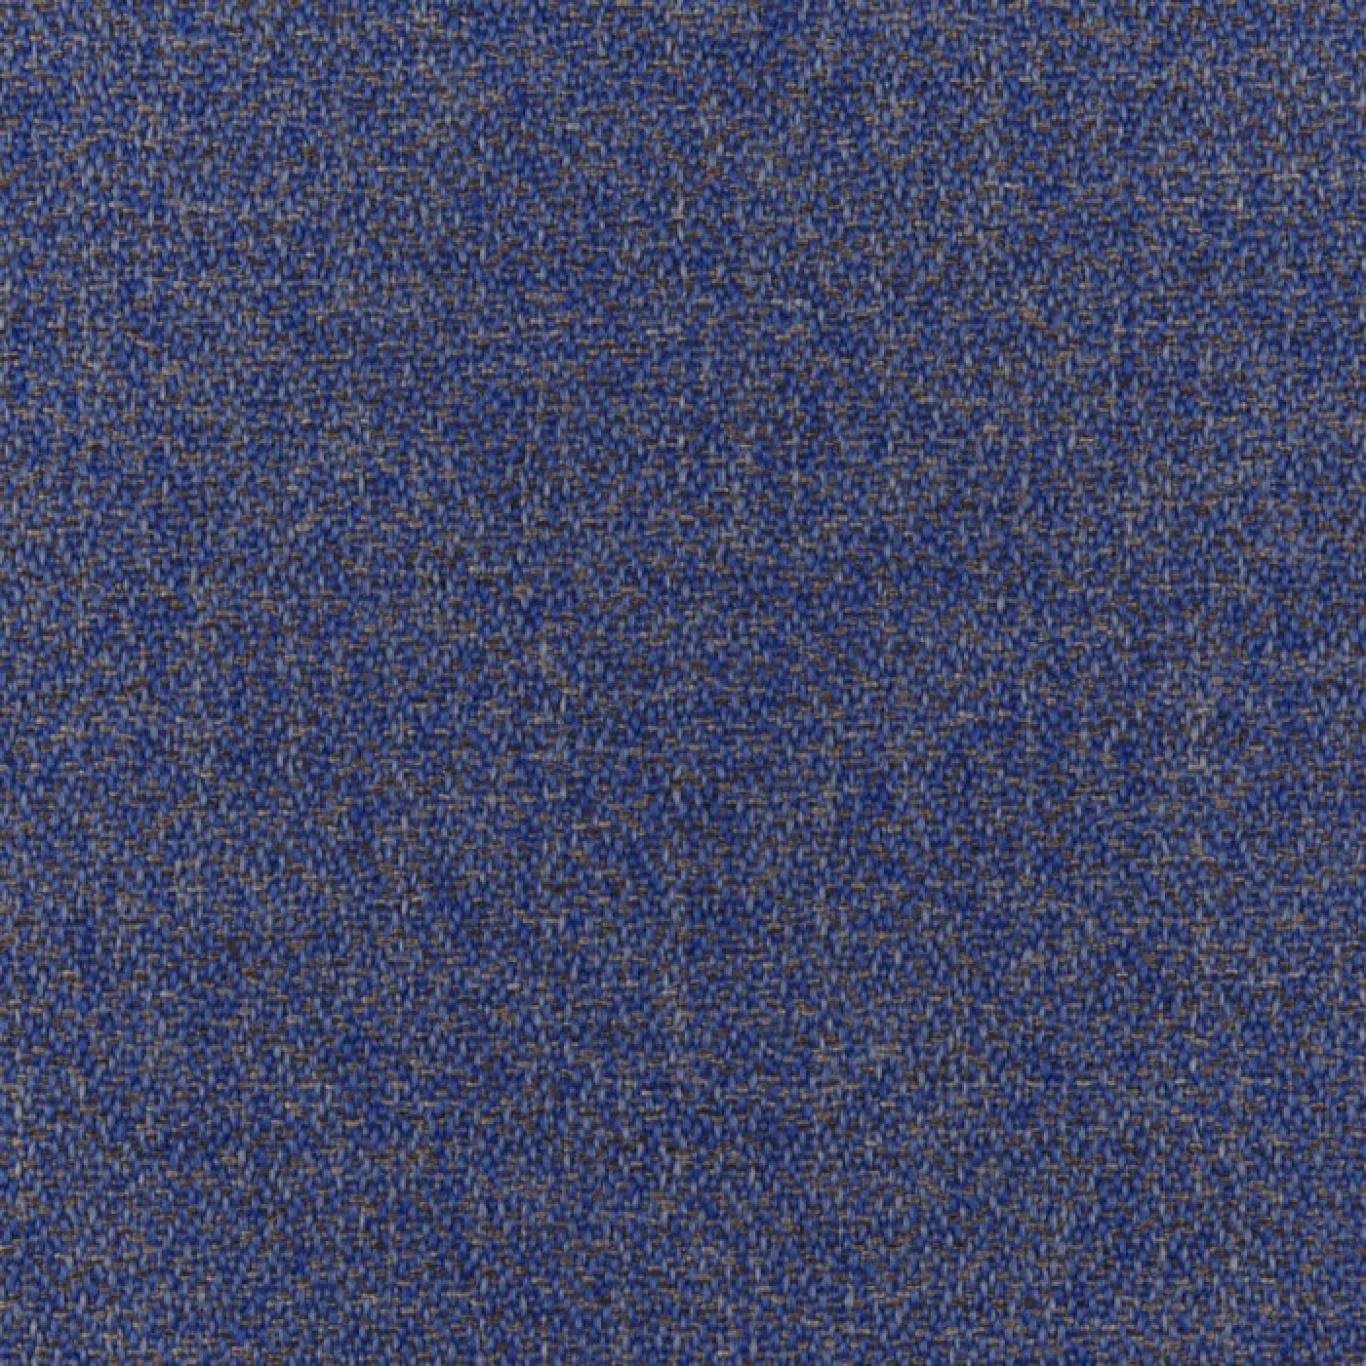 Image of Prestigious Harrison Loch Fabric